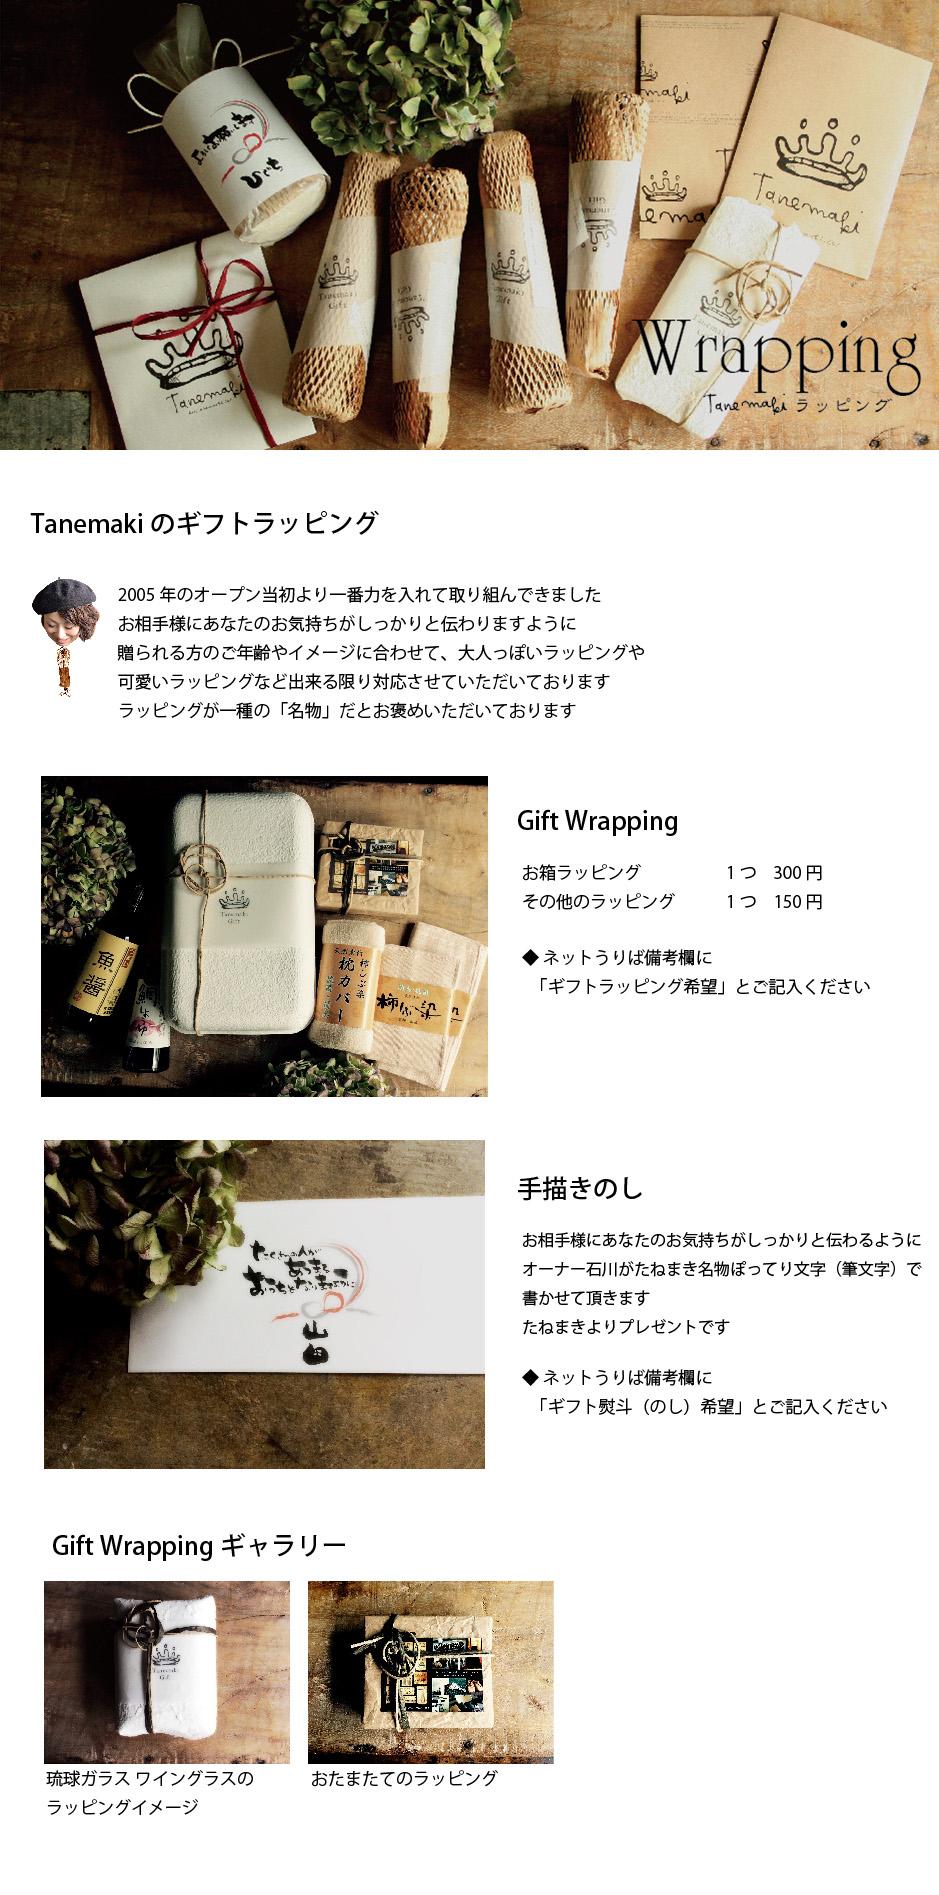 neturiba_gift_10_Wrapping.jpg